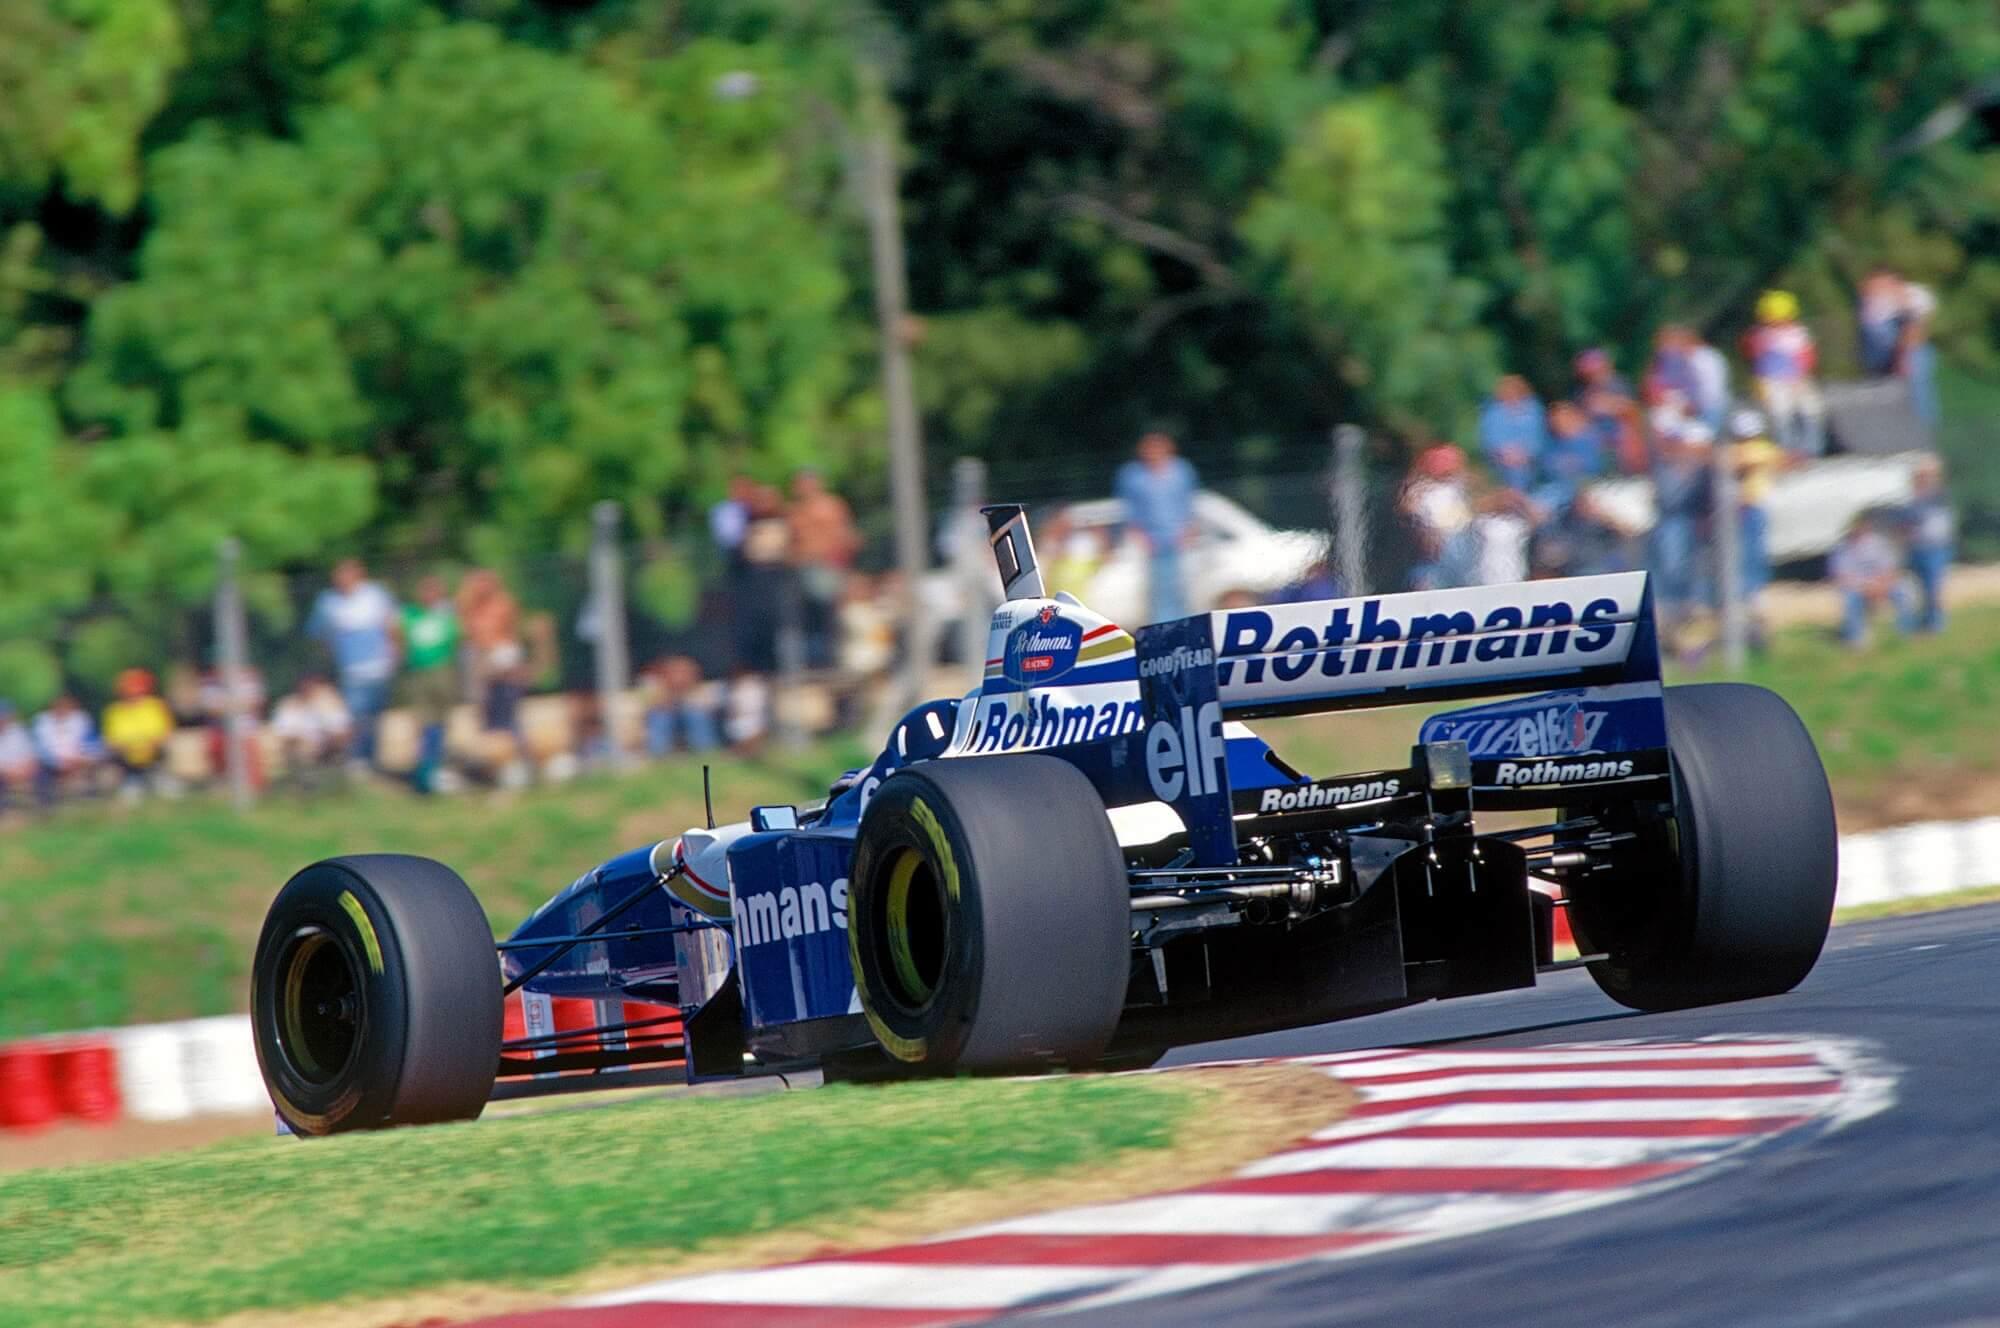 Williams Jaques Villeneuve